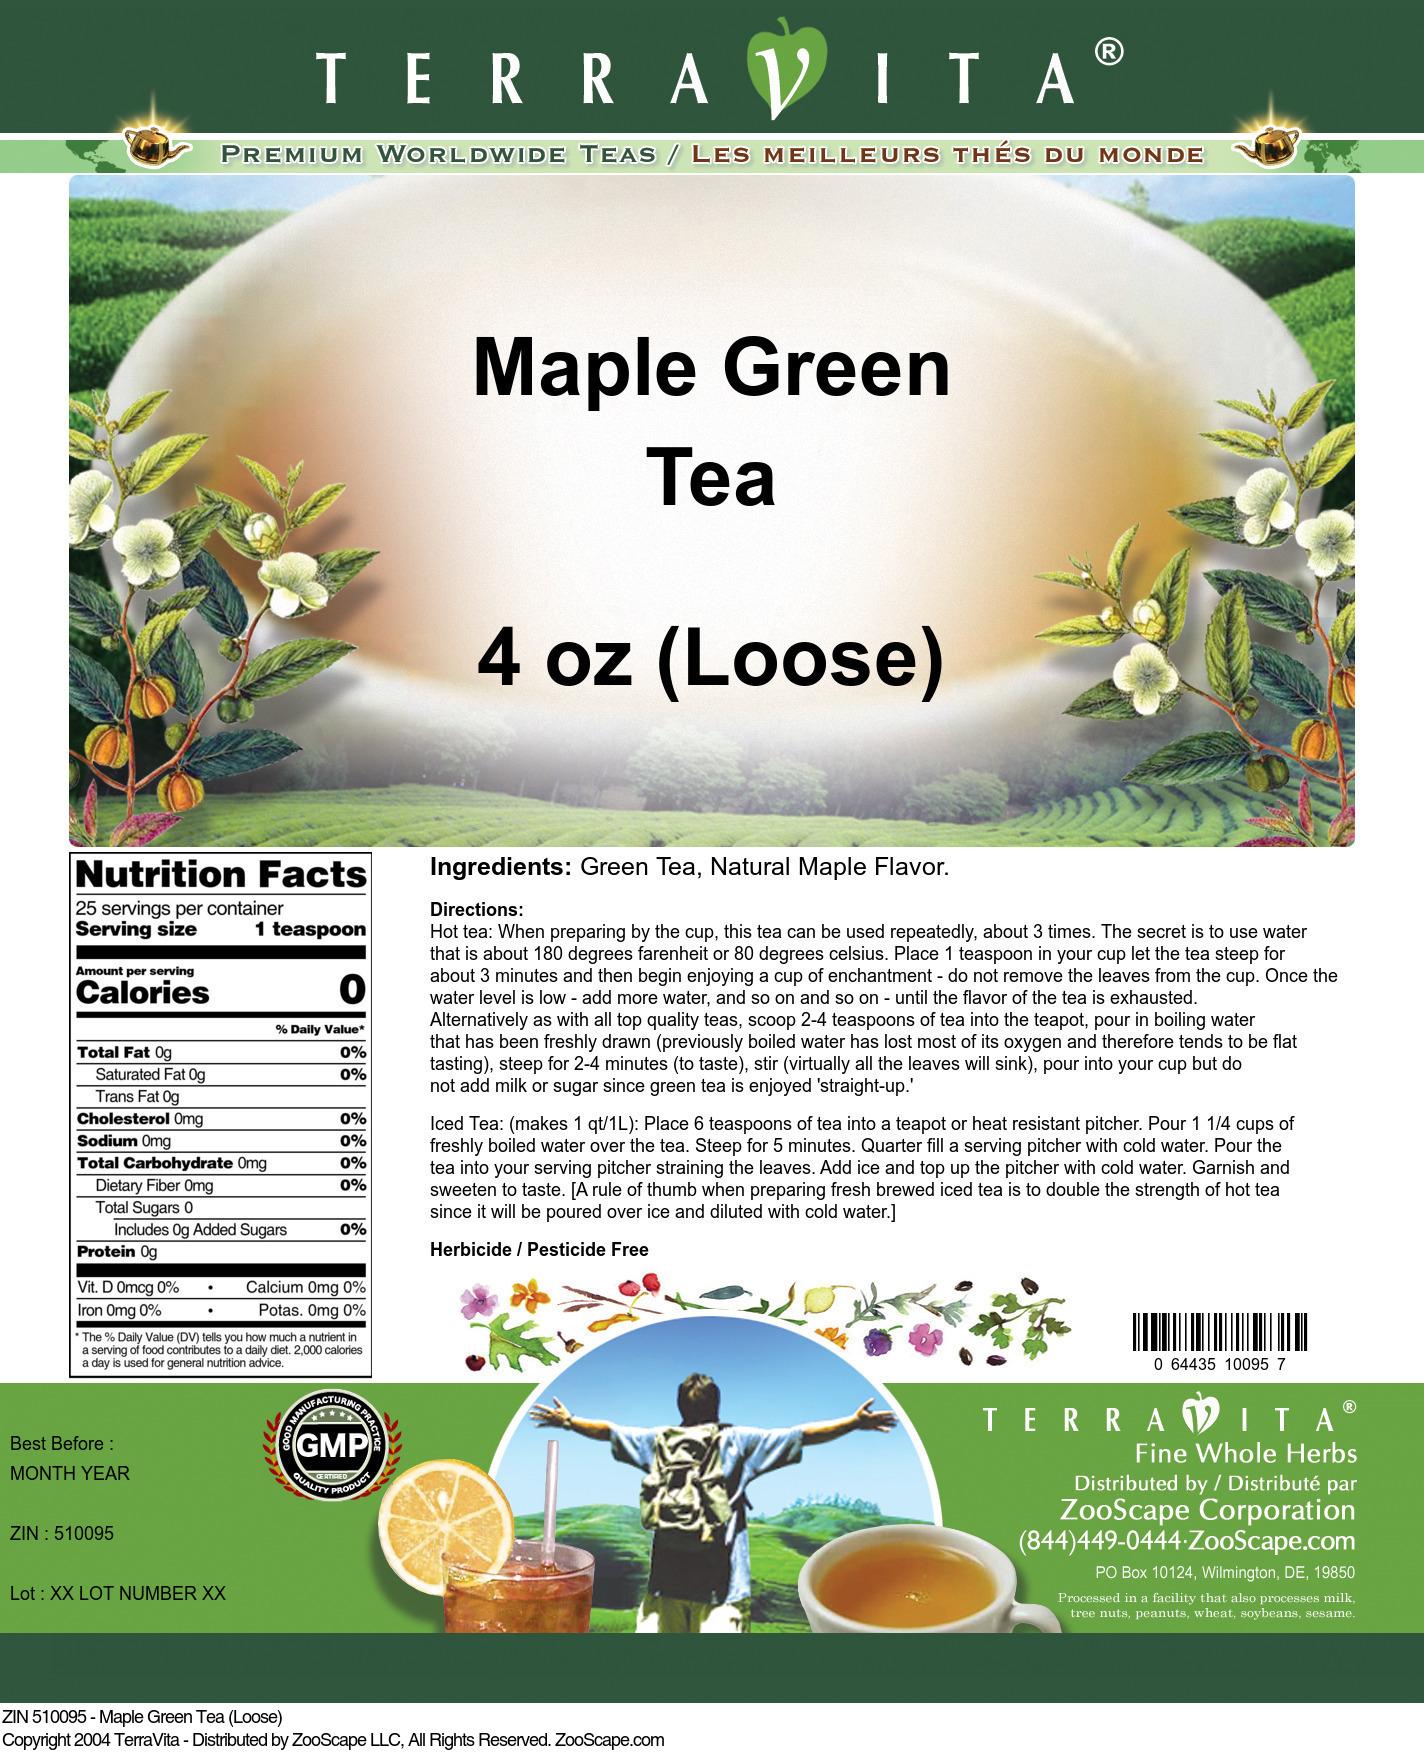 Maple Green Tea (Loose) - Label